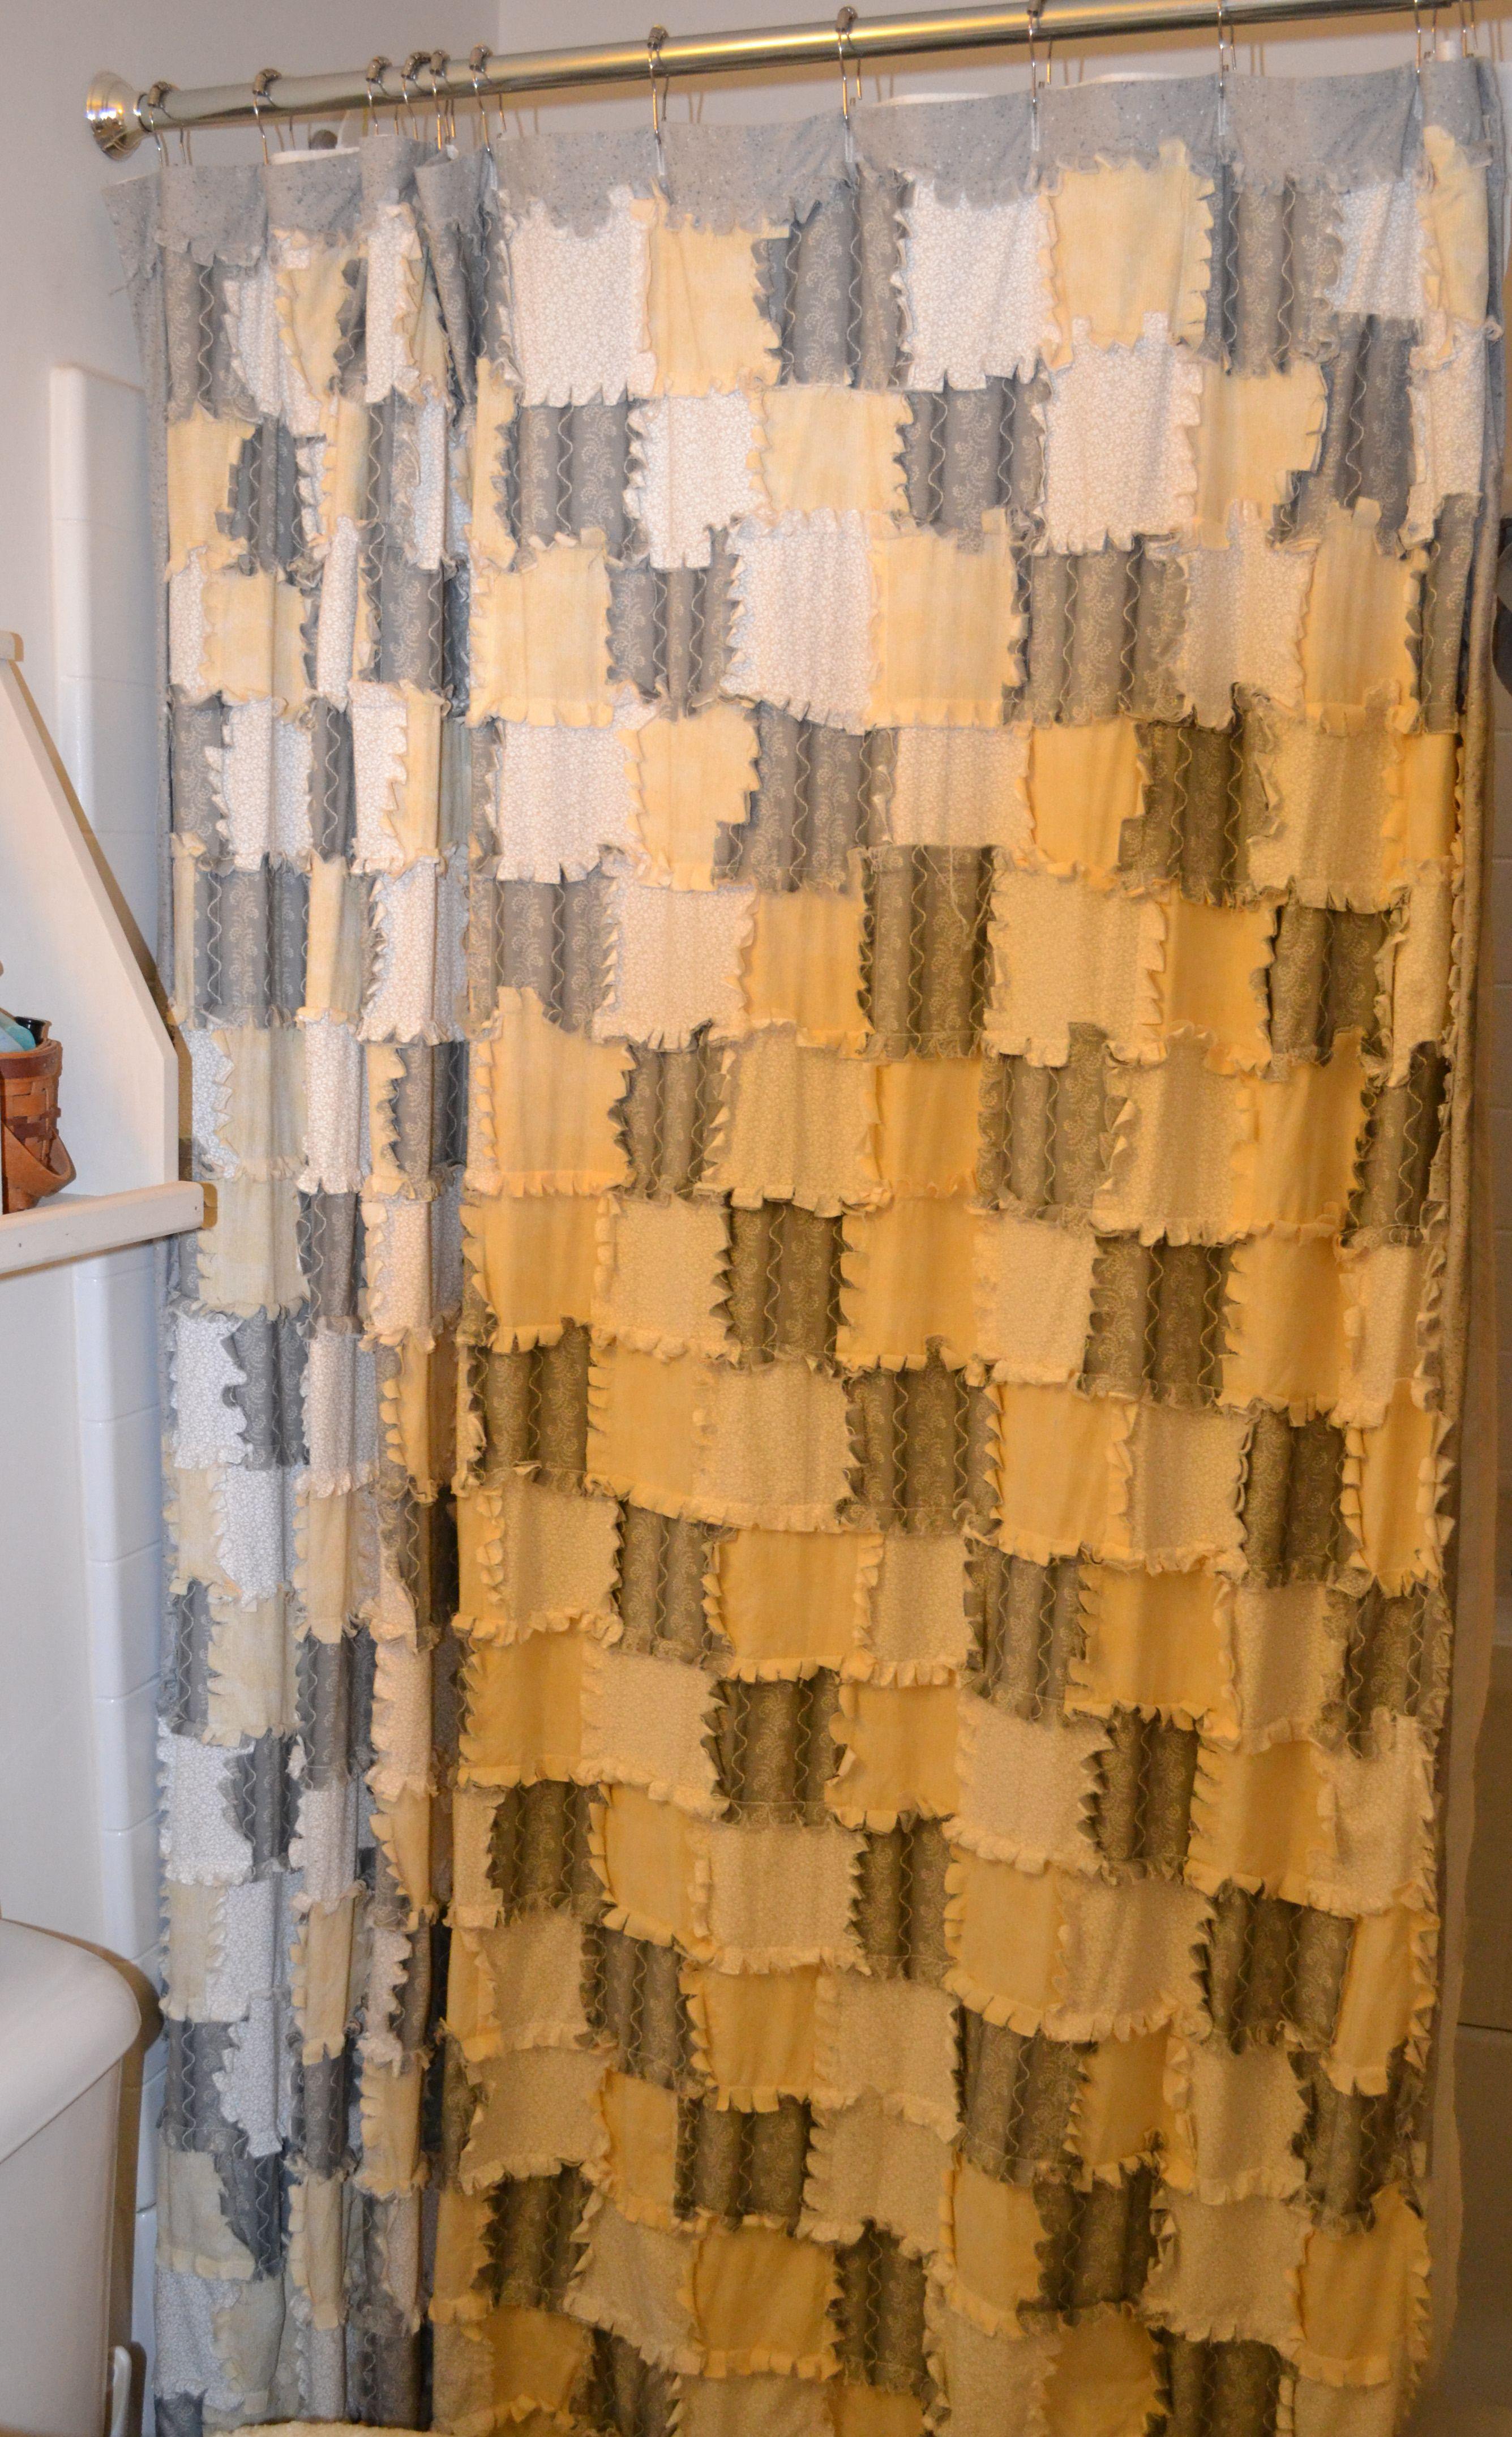 Reverse rag quilted shower curtain | Crafty - Quilt N Sew =D ... : rag quilt curtains - Adamdwight.com